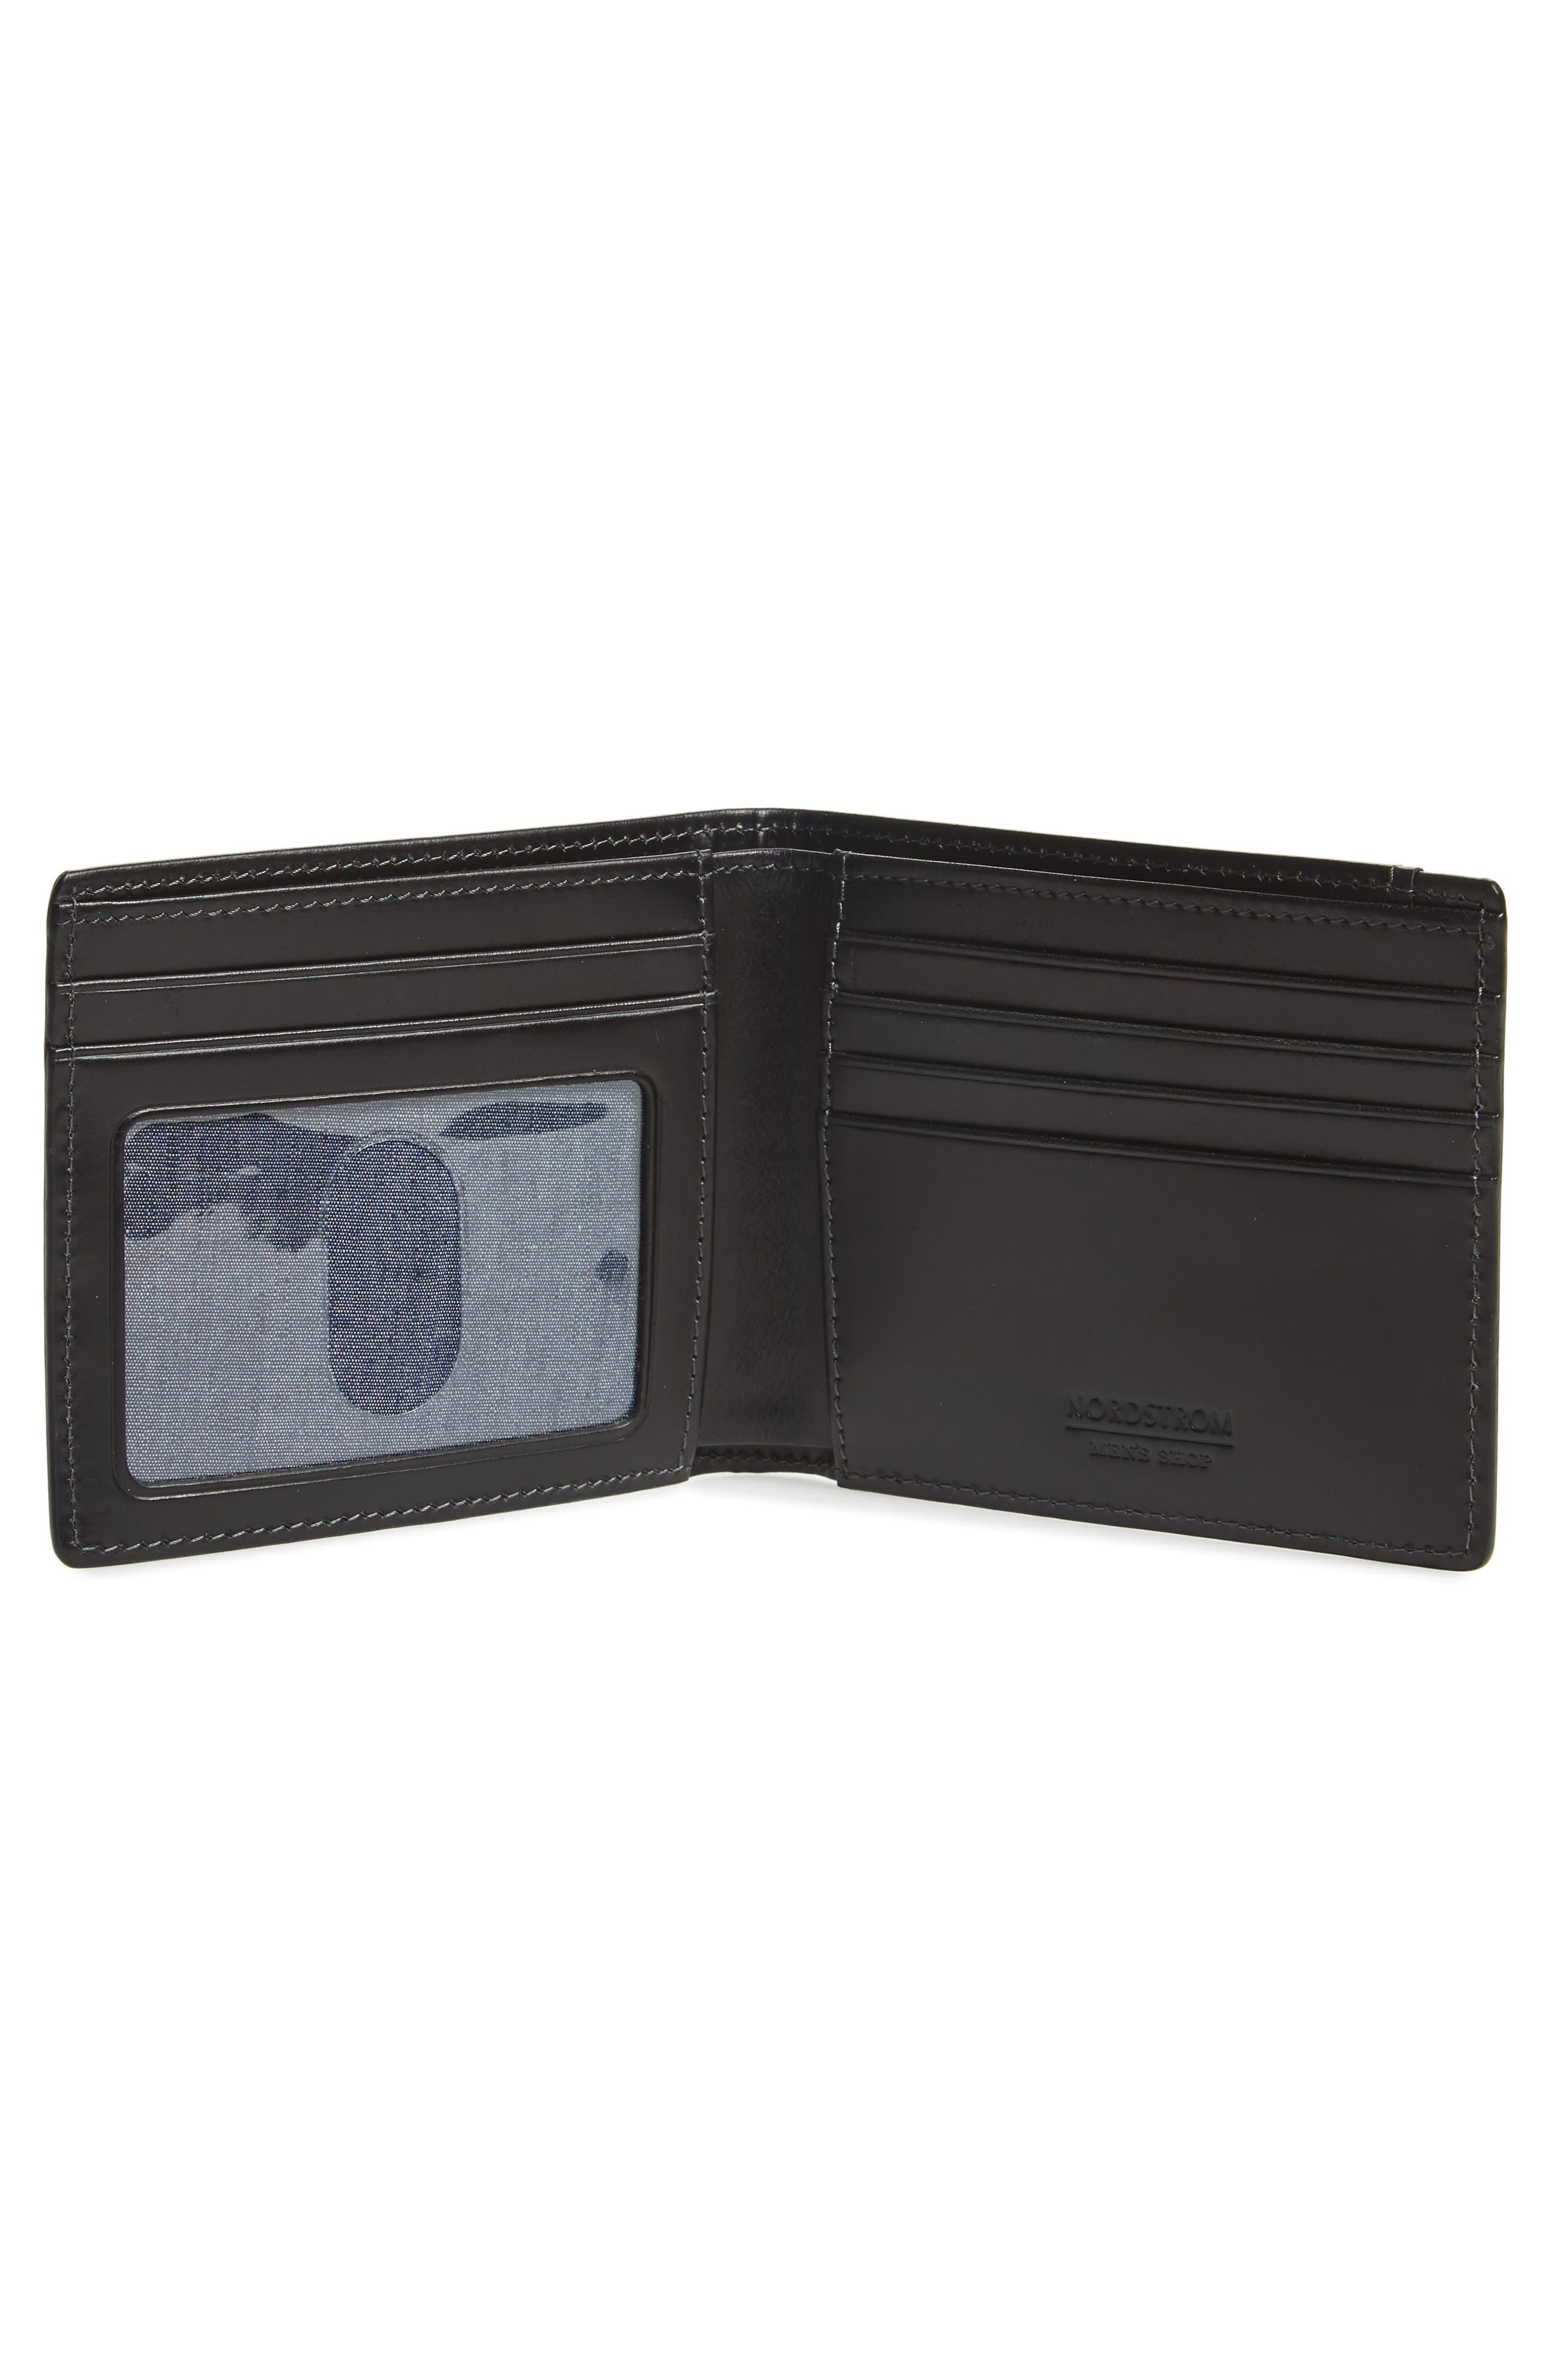 NORDSTROM MEN'S SHOP, Wyatt RFID Leather Wallet, Alternate thumbnail 2, color, BLACK